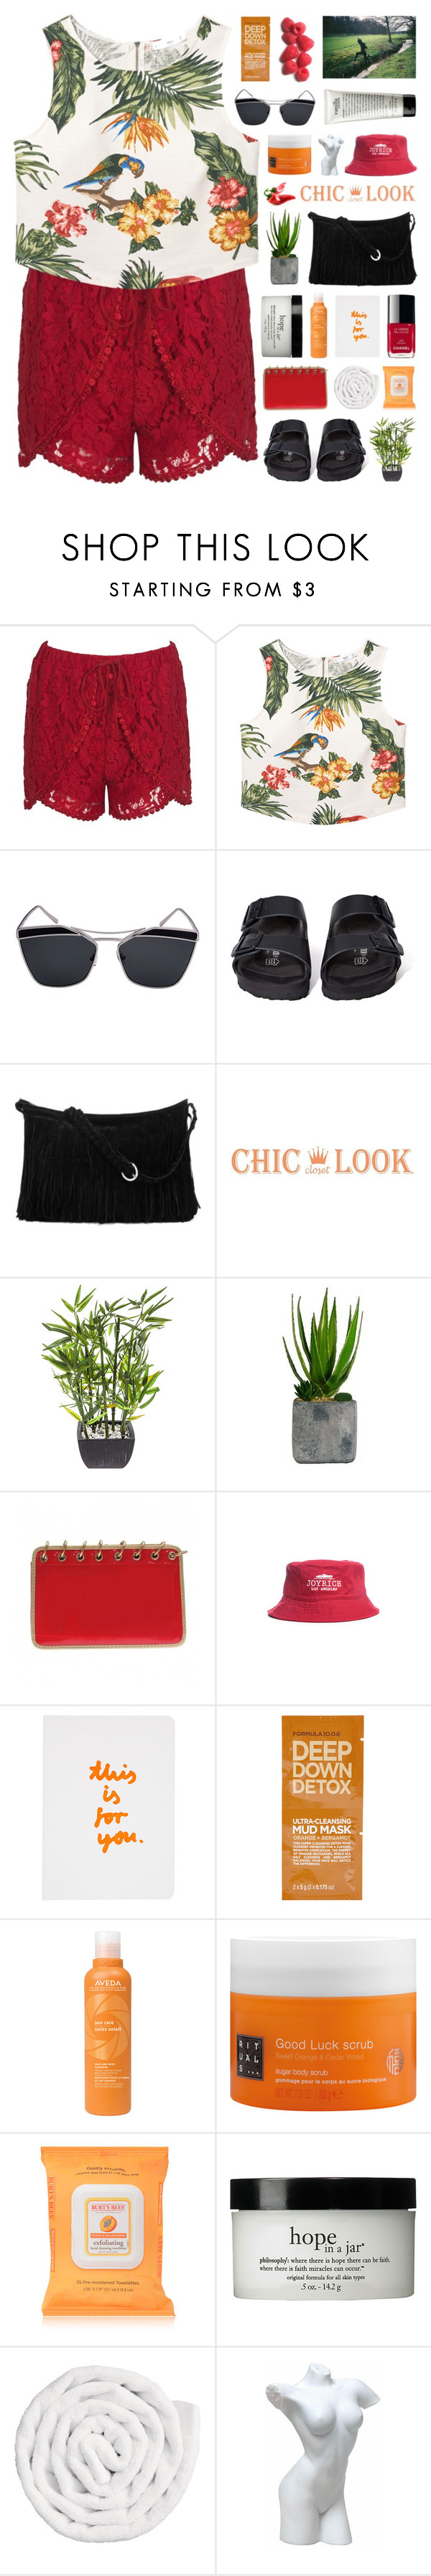 """CHIC LOOK CLOSET"" by novalikarida ❤ liked on Polyvore featuring MANGO, Birkenstock, Laura Ashley, Joyrich, Chanel, Topshop, Aveda, Rituals, Burt's Bees and philosophy"